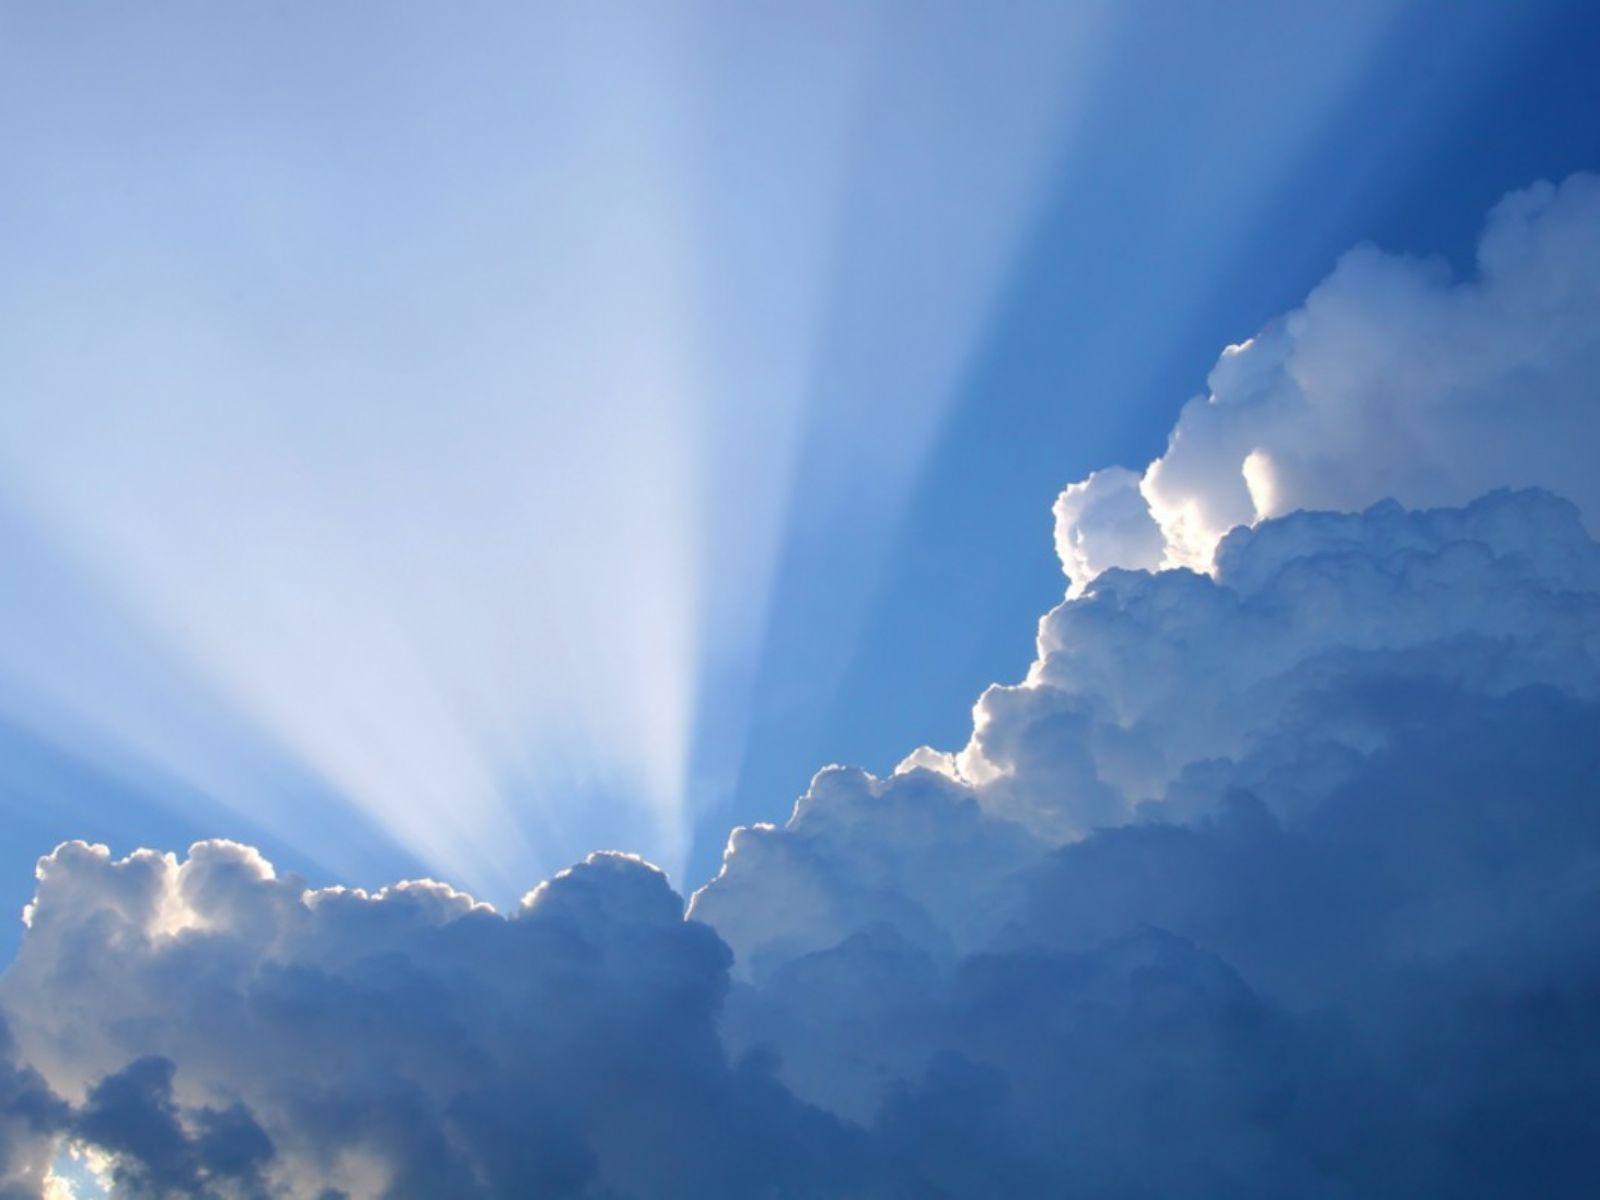 облако, свет, небо, обои на рабочий стол